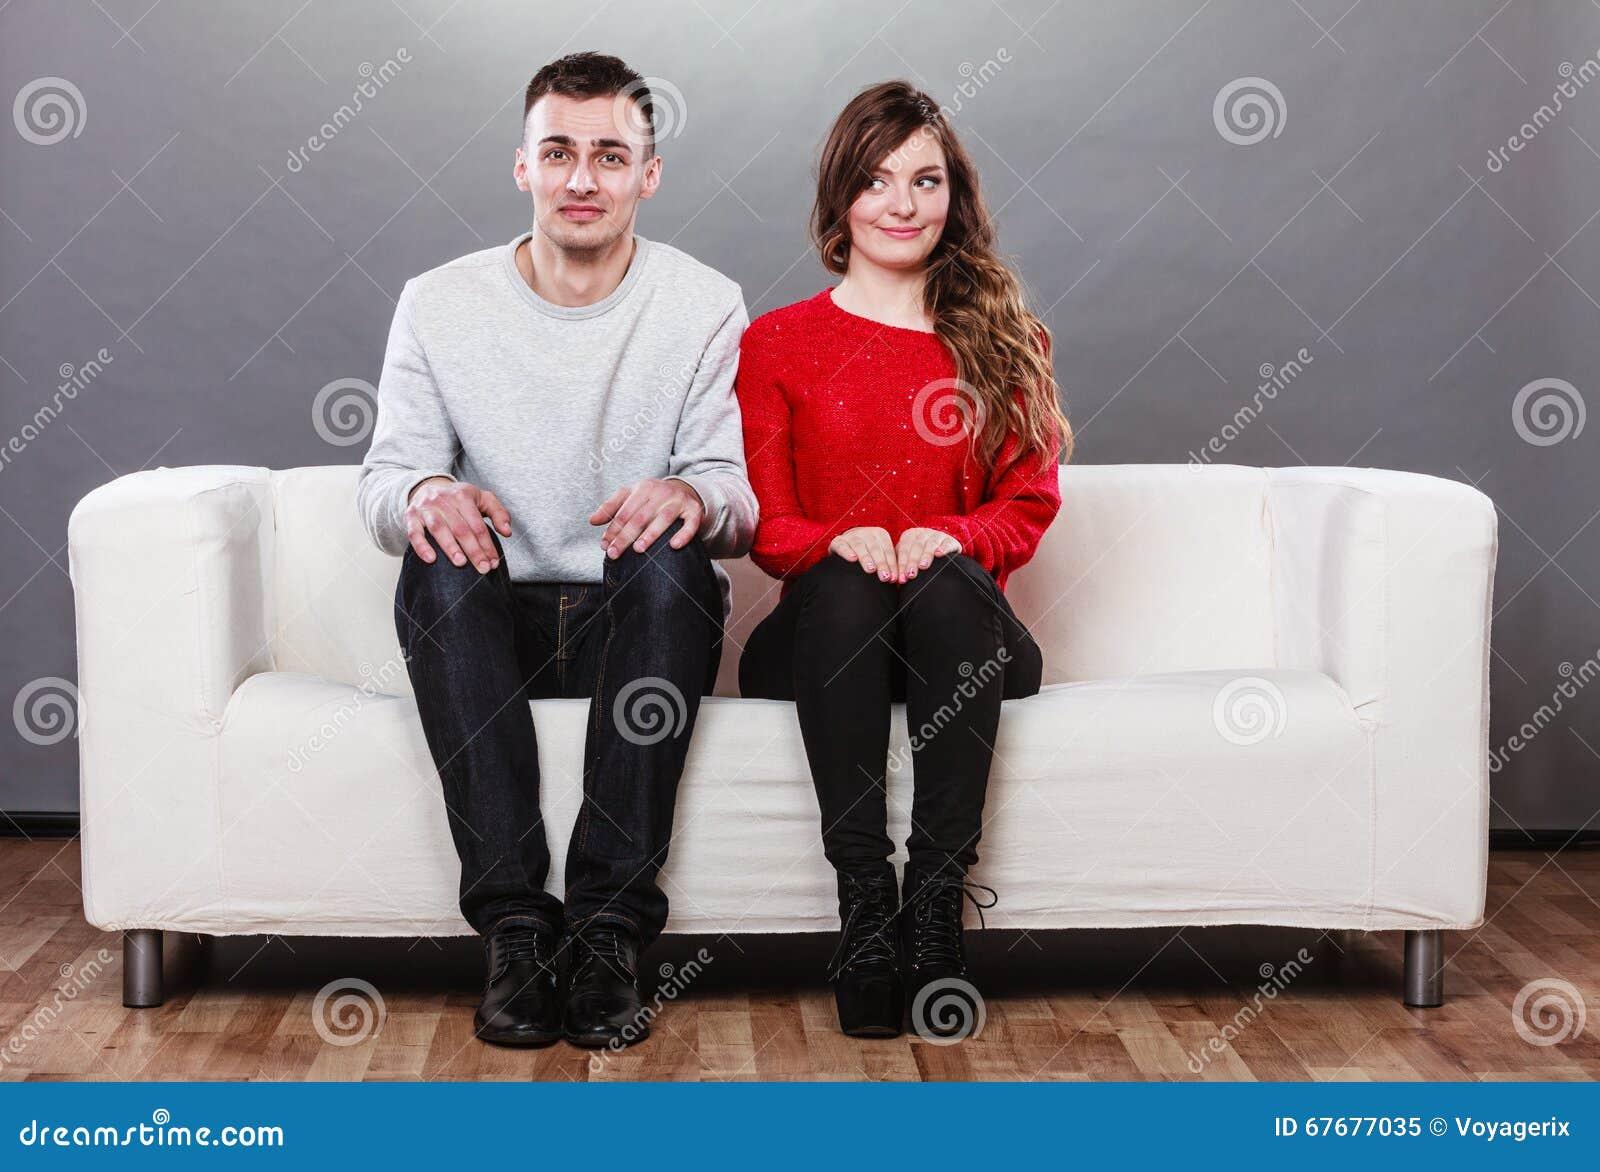 tondel dating NYC